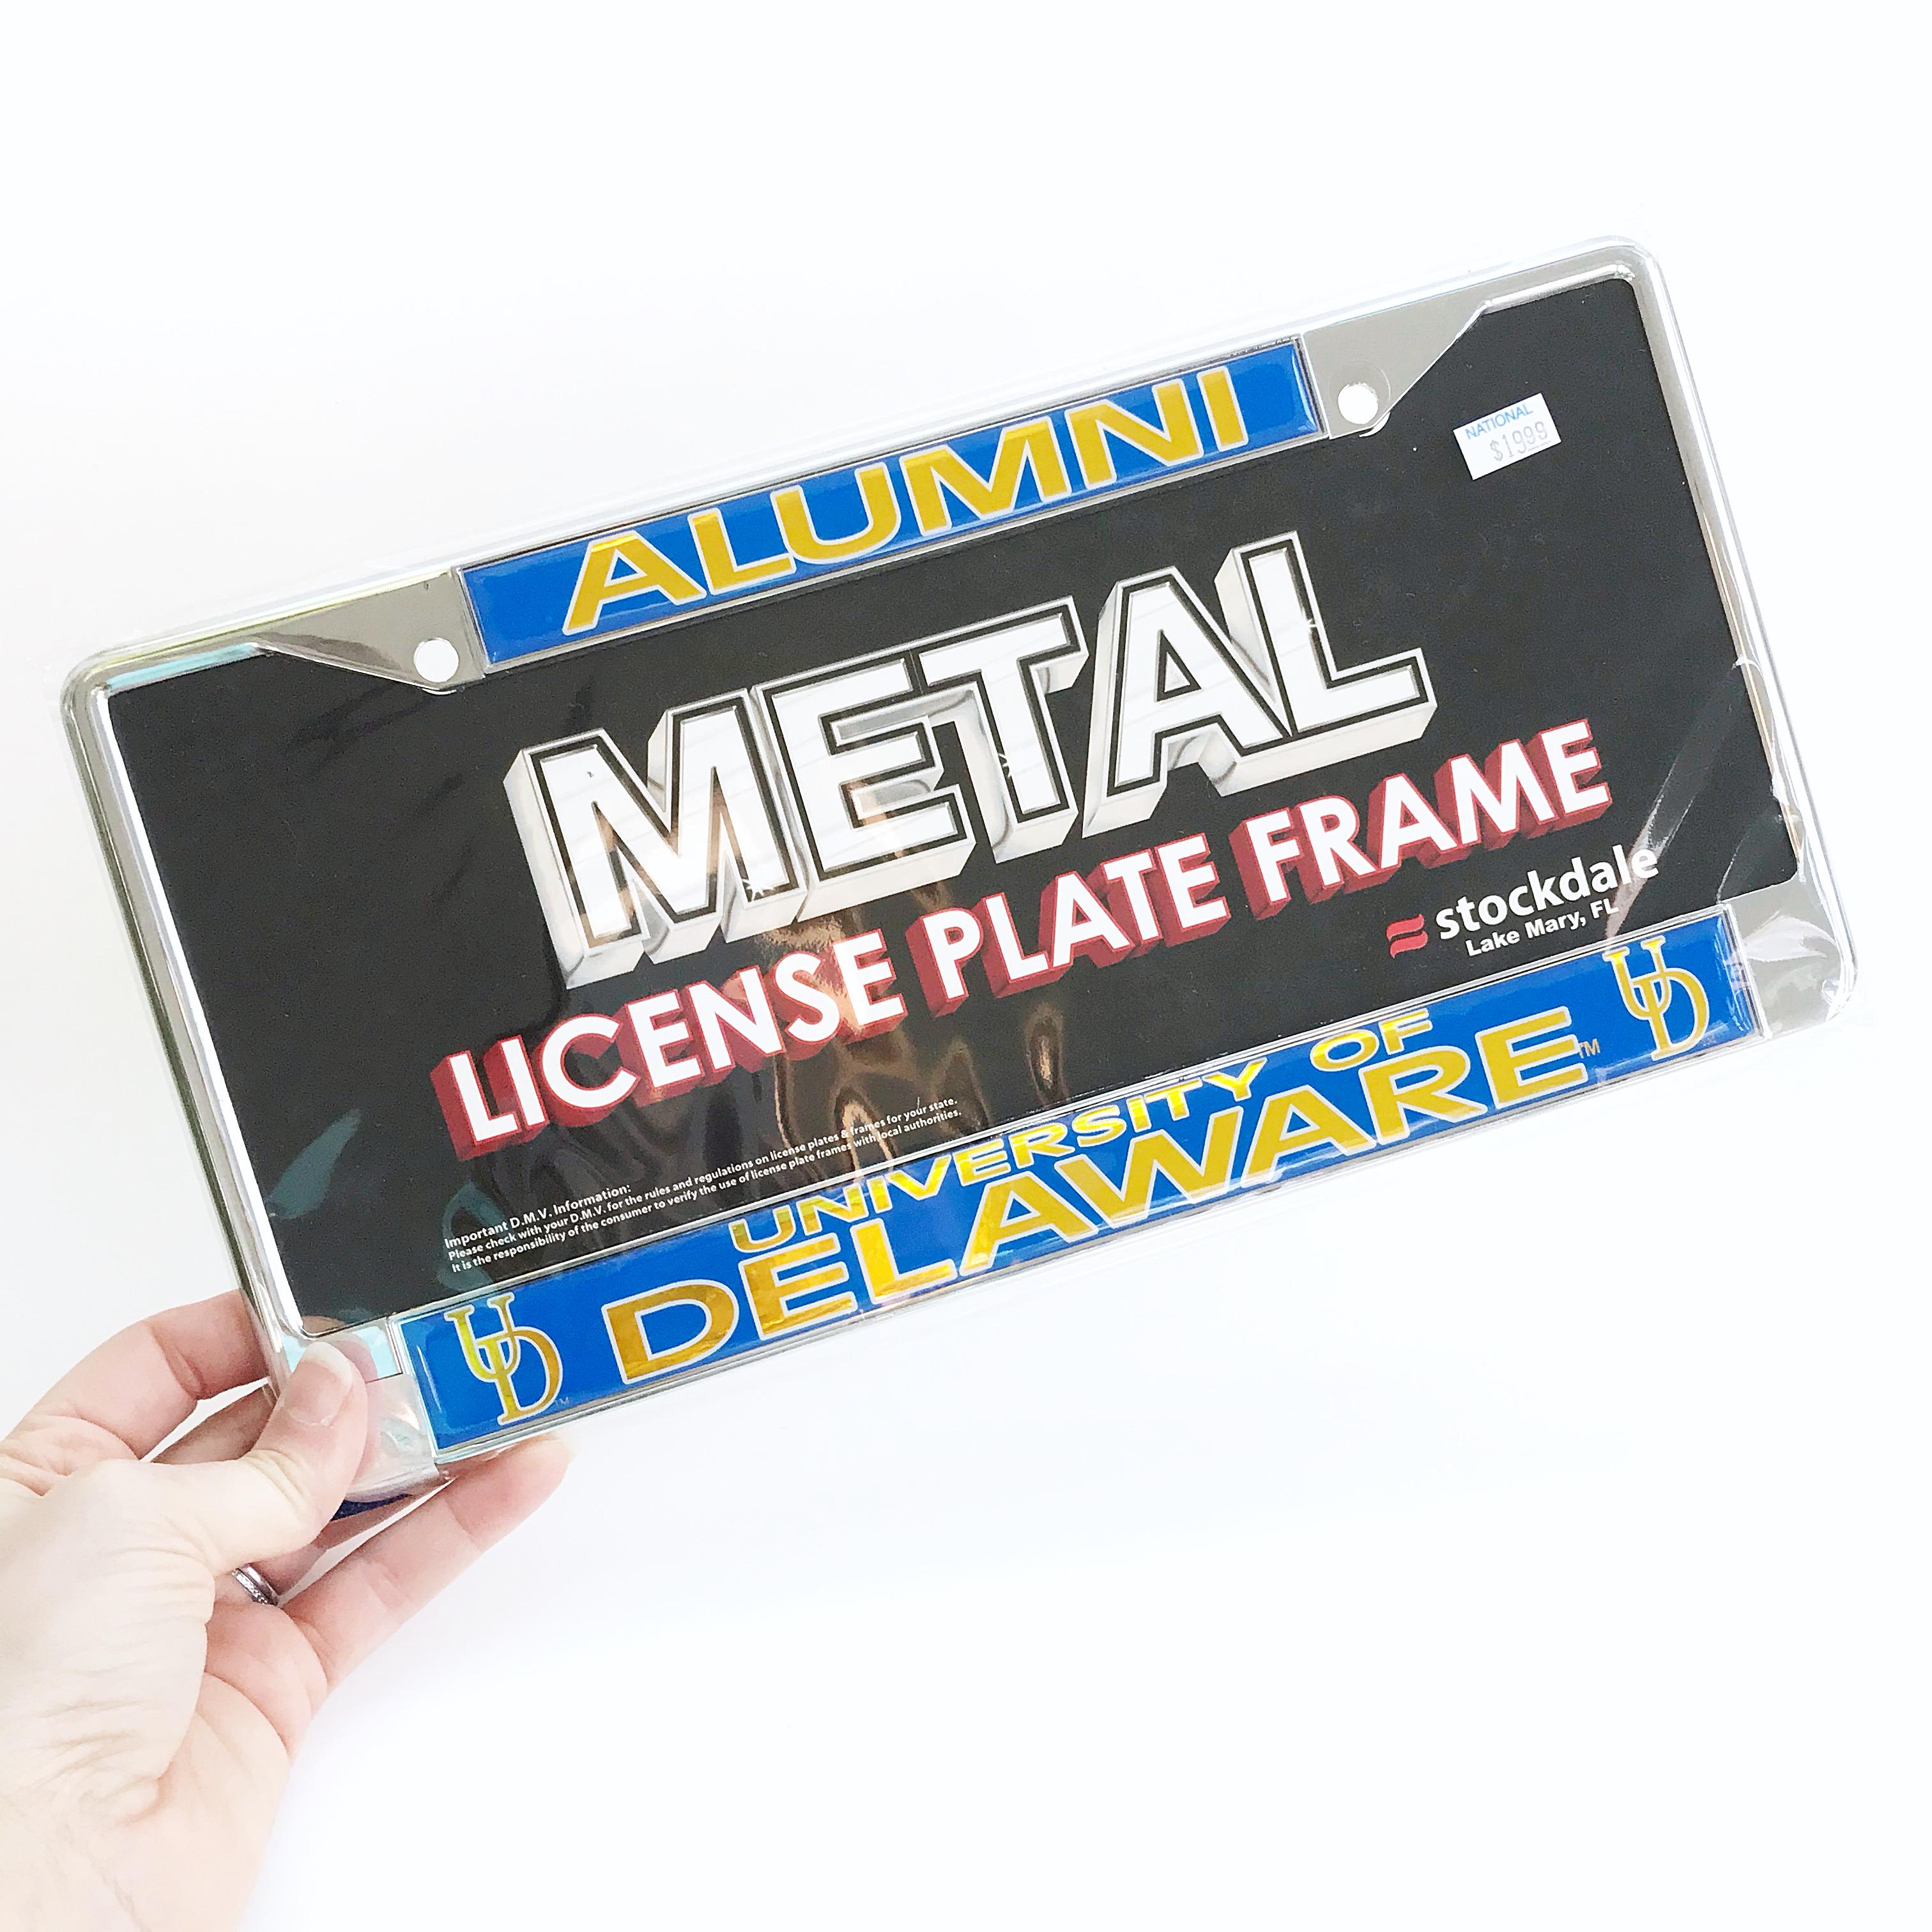 Old Fashioned Alumni License Plate Frame Mold - Framed Art Ideas ...